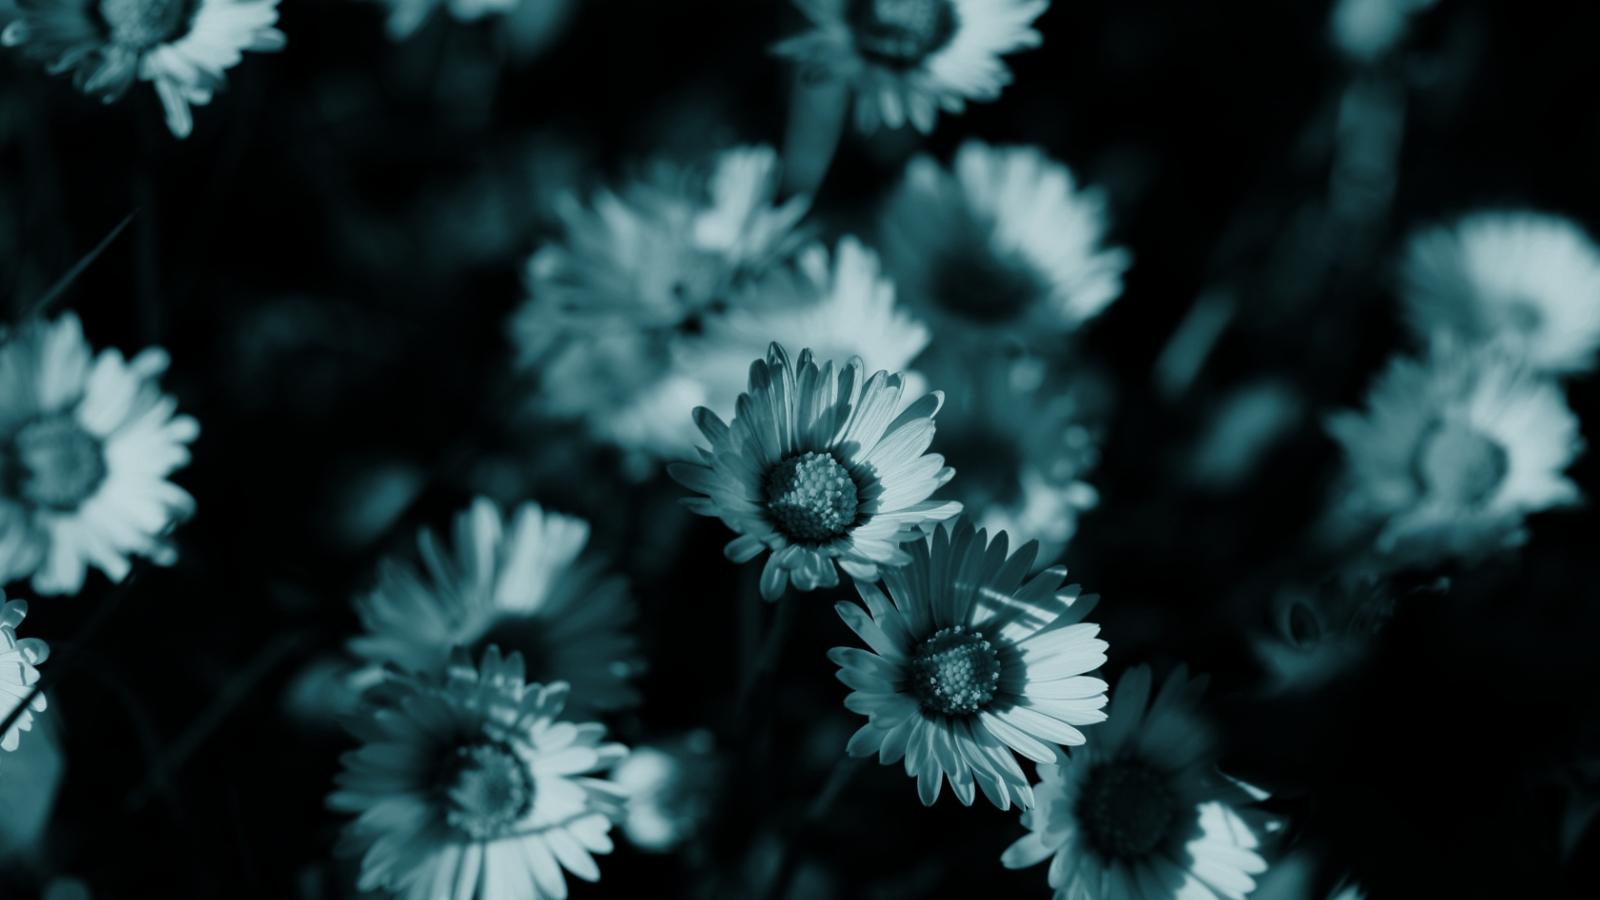 Free Download Dark Flowers Monochrome Hd Wallpaper Background